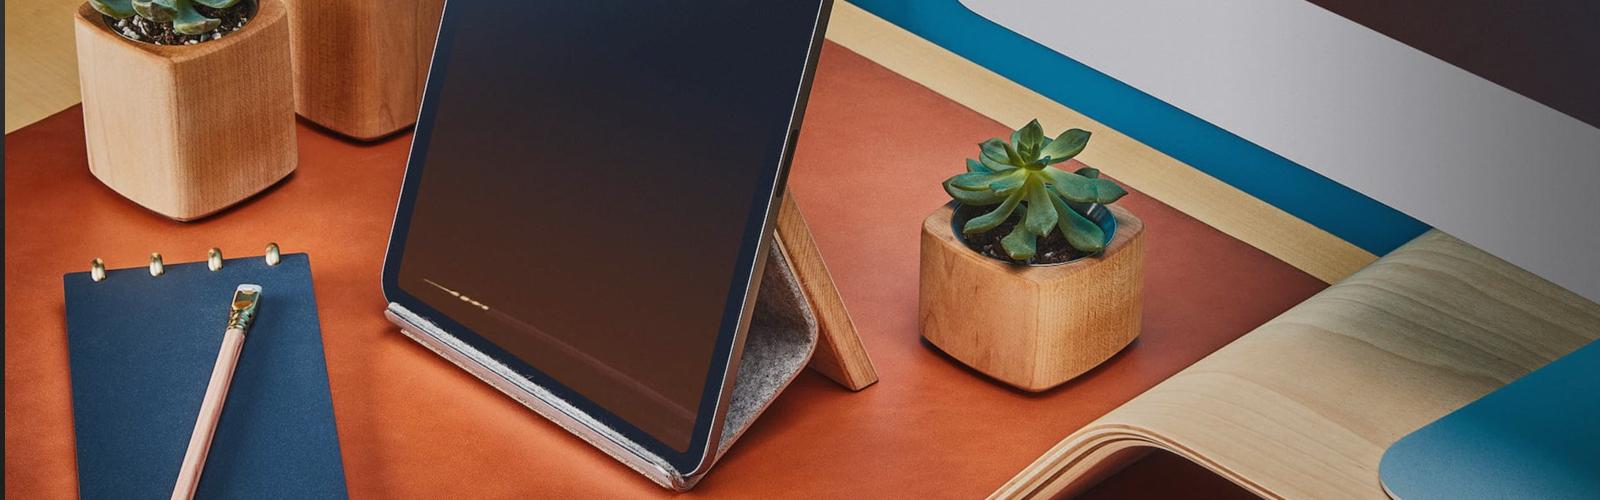 iPad Accessories